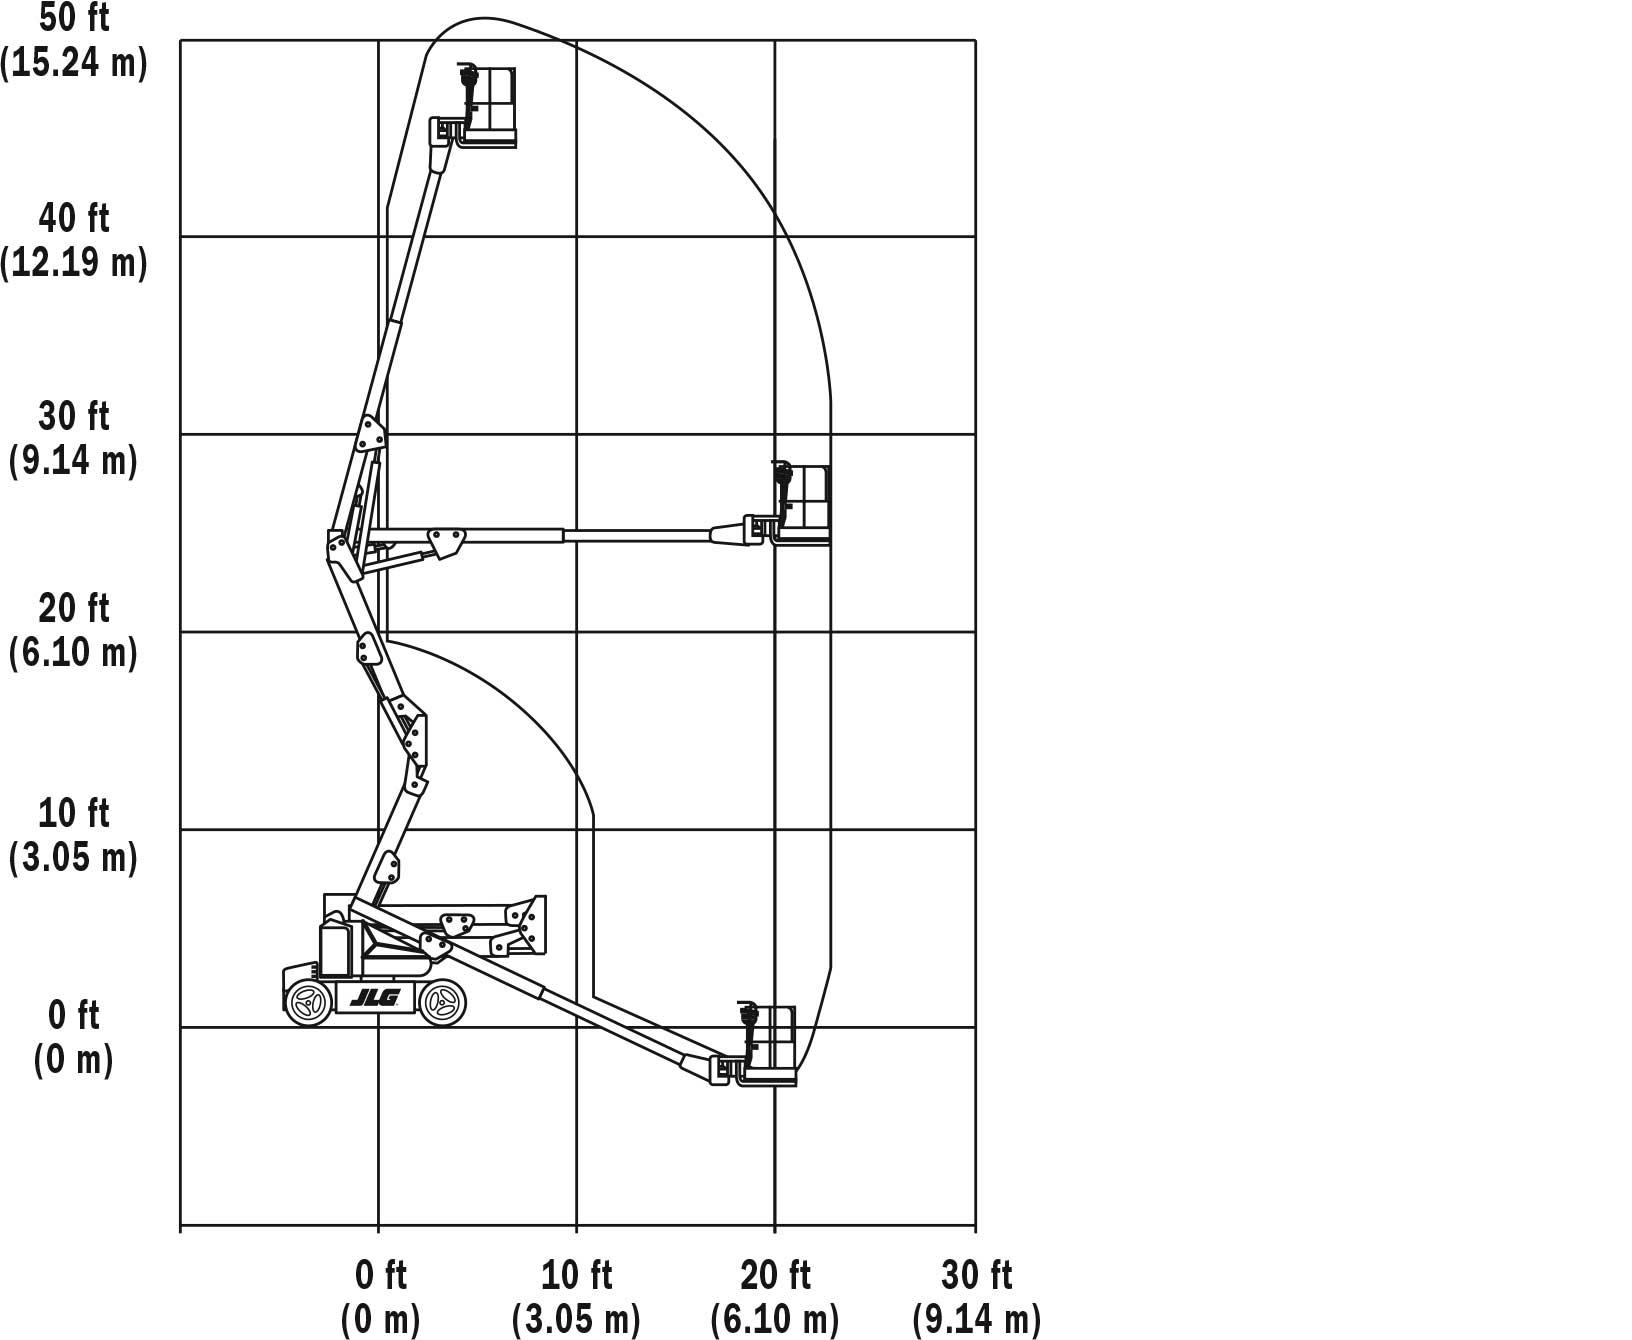 e-m 450a range chart